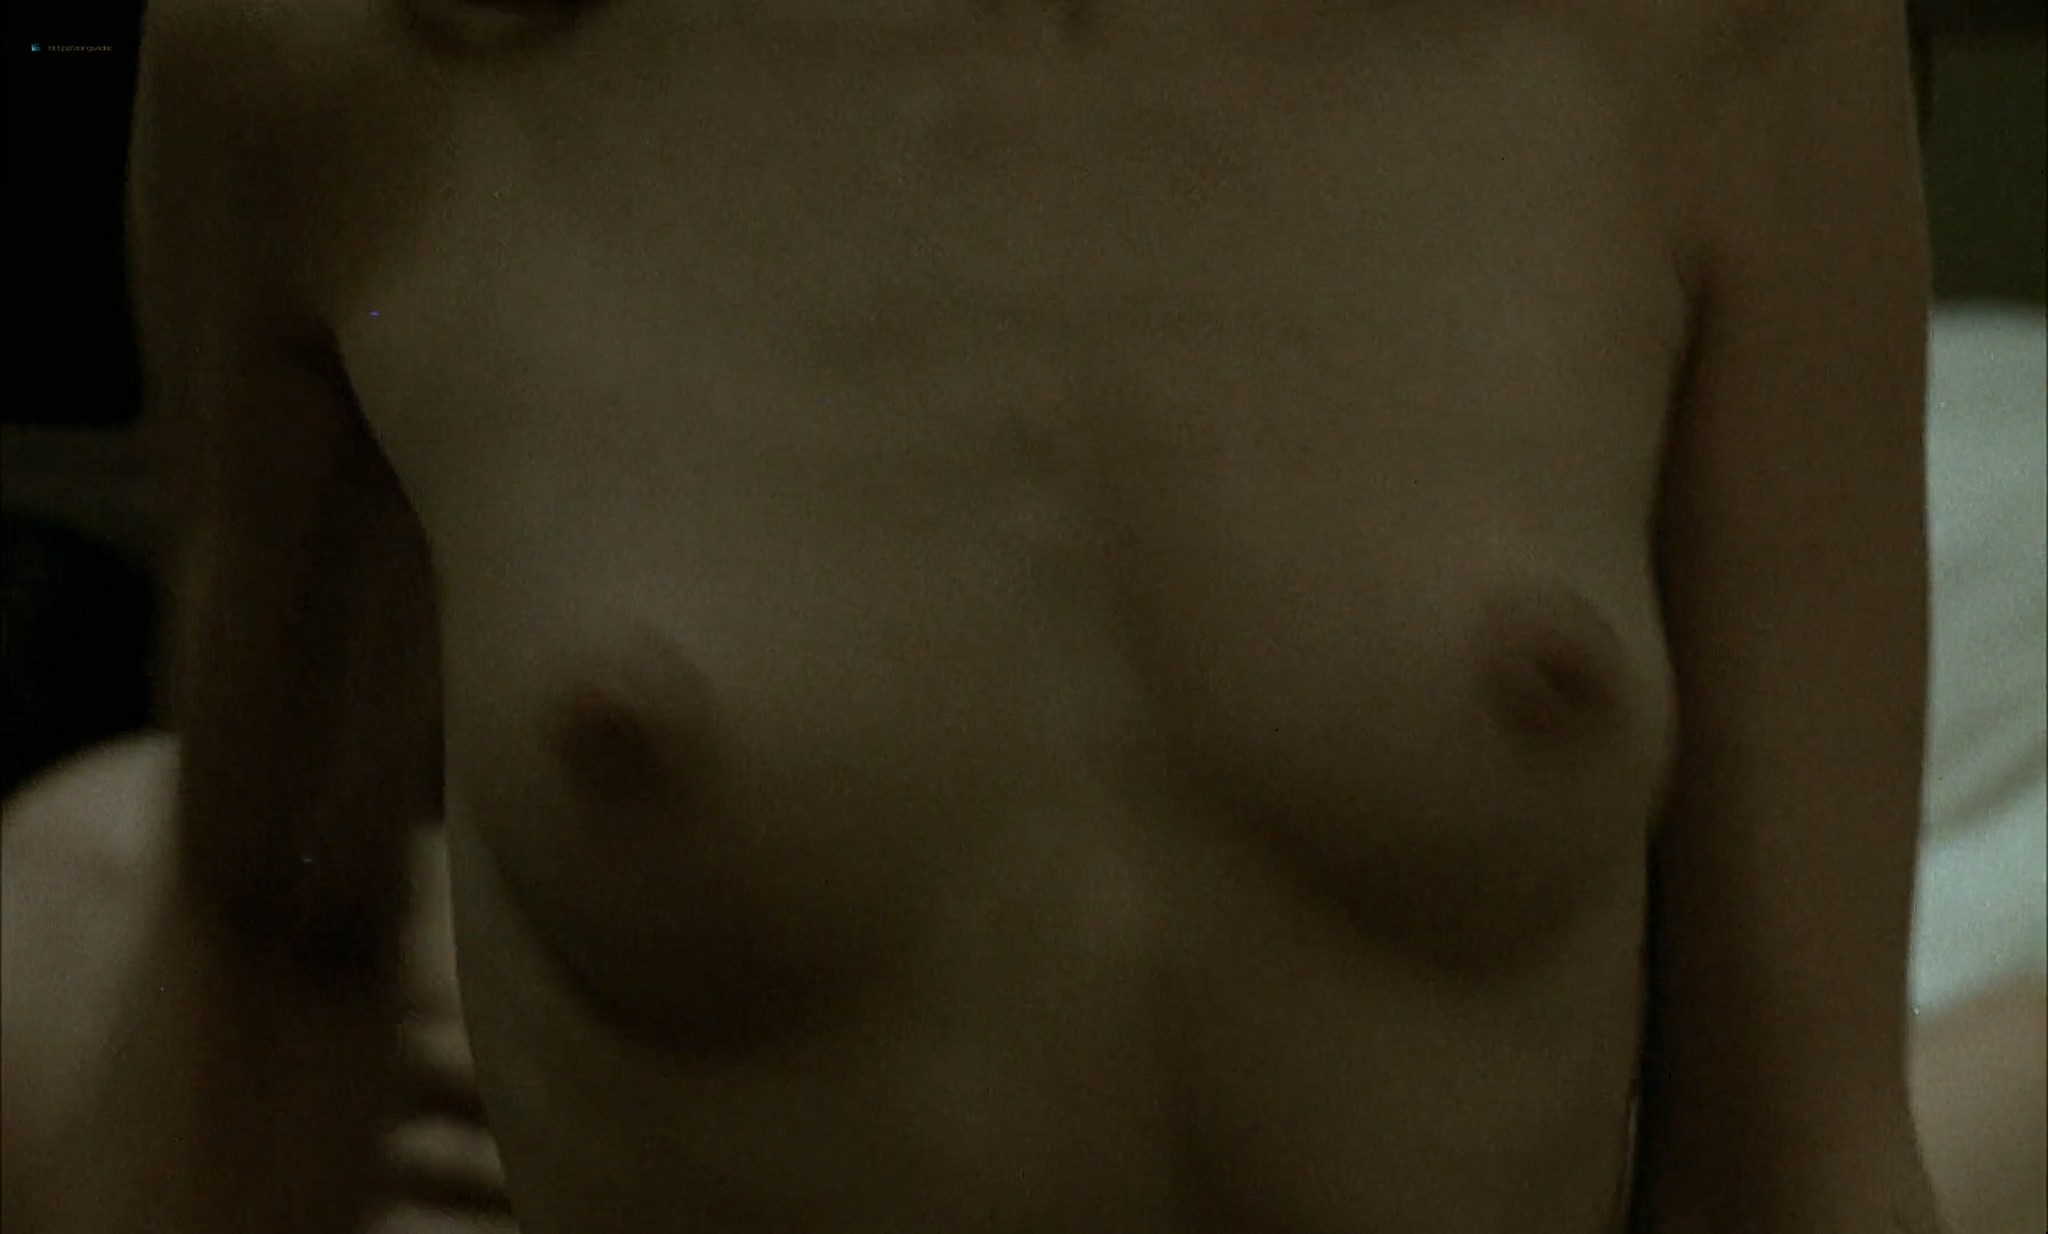 Romy Schneider nude butt Nadia Vasil bush others orgy - L'important c'est d'aimer (FR-1975) HD 1080p BluRay (9)